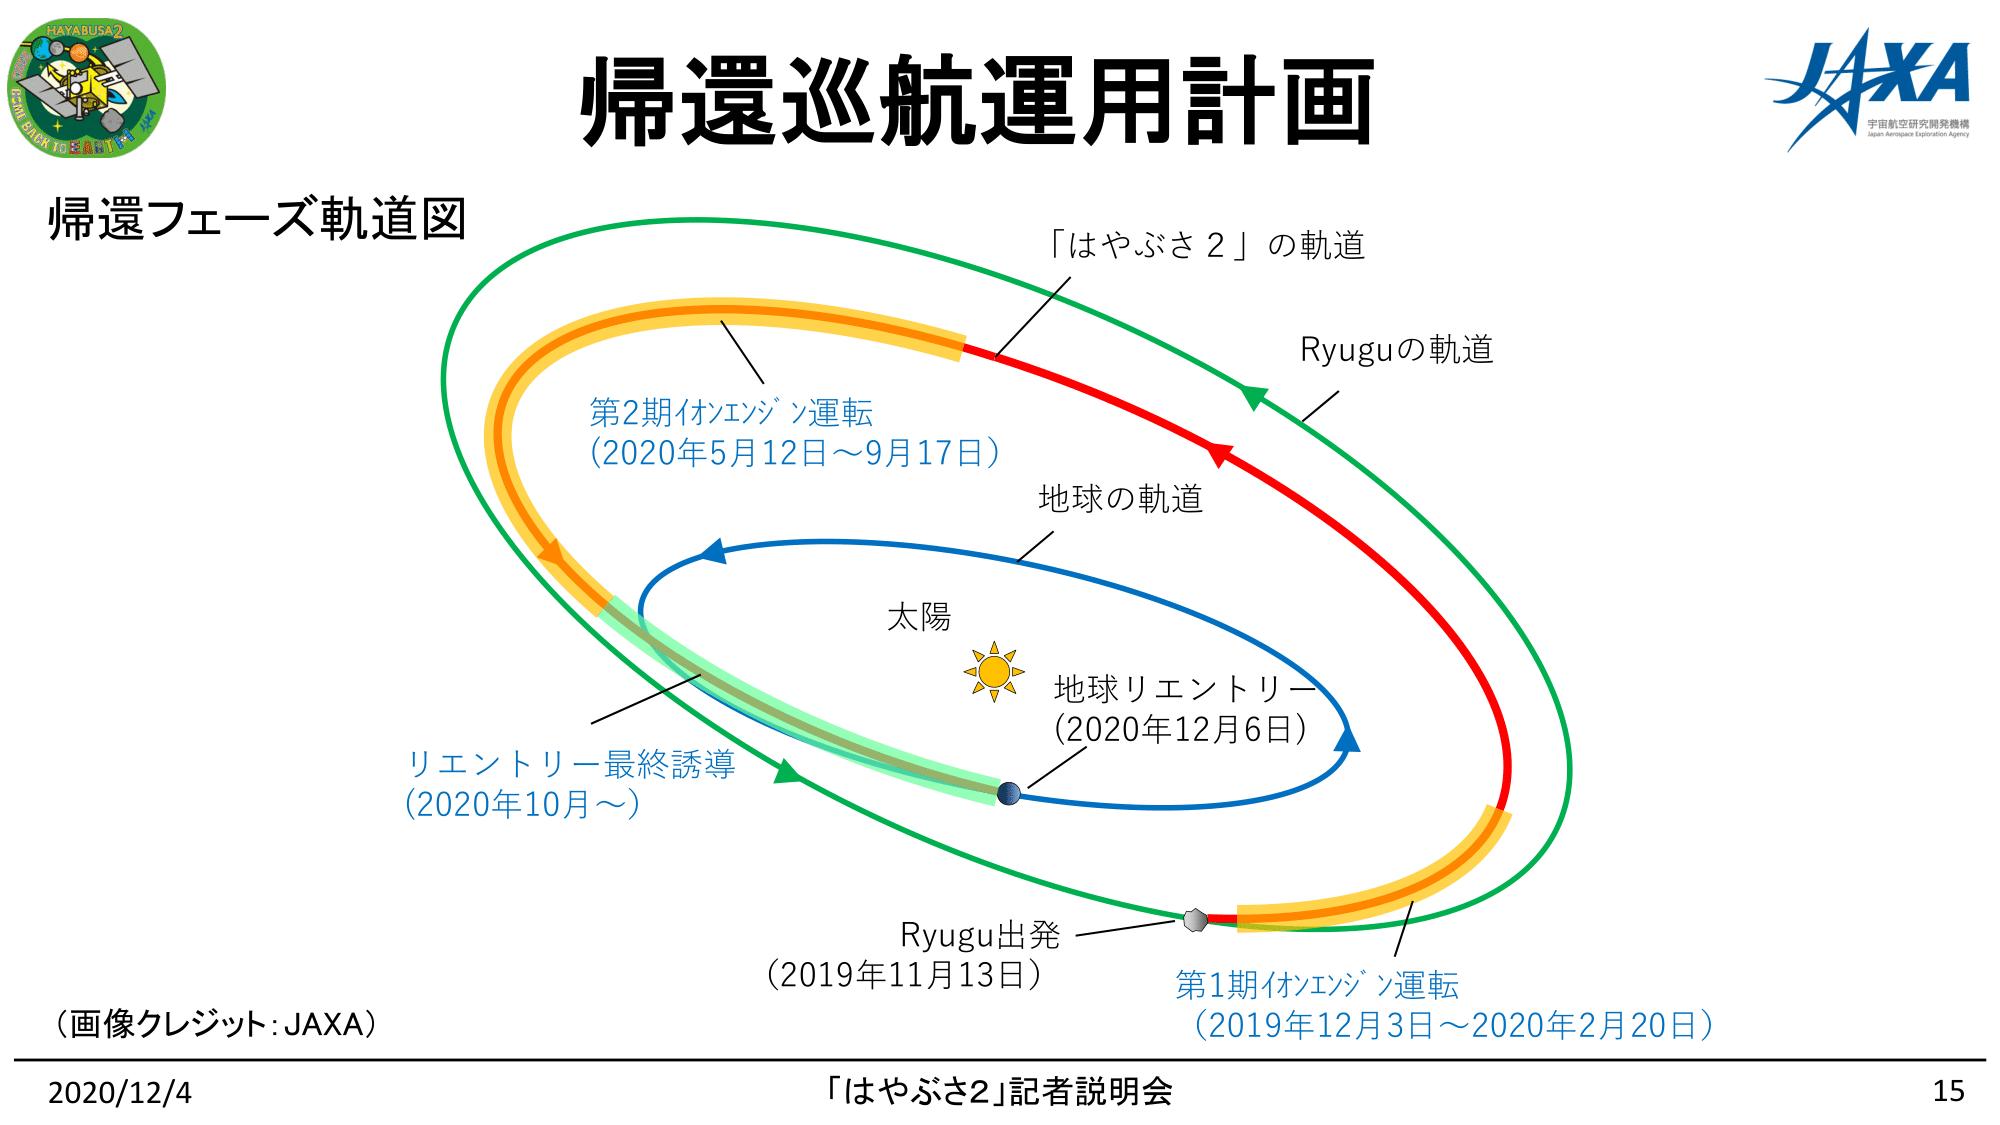 f:id:Imamura:20201204153905p:plain